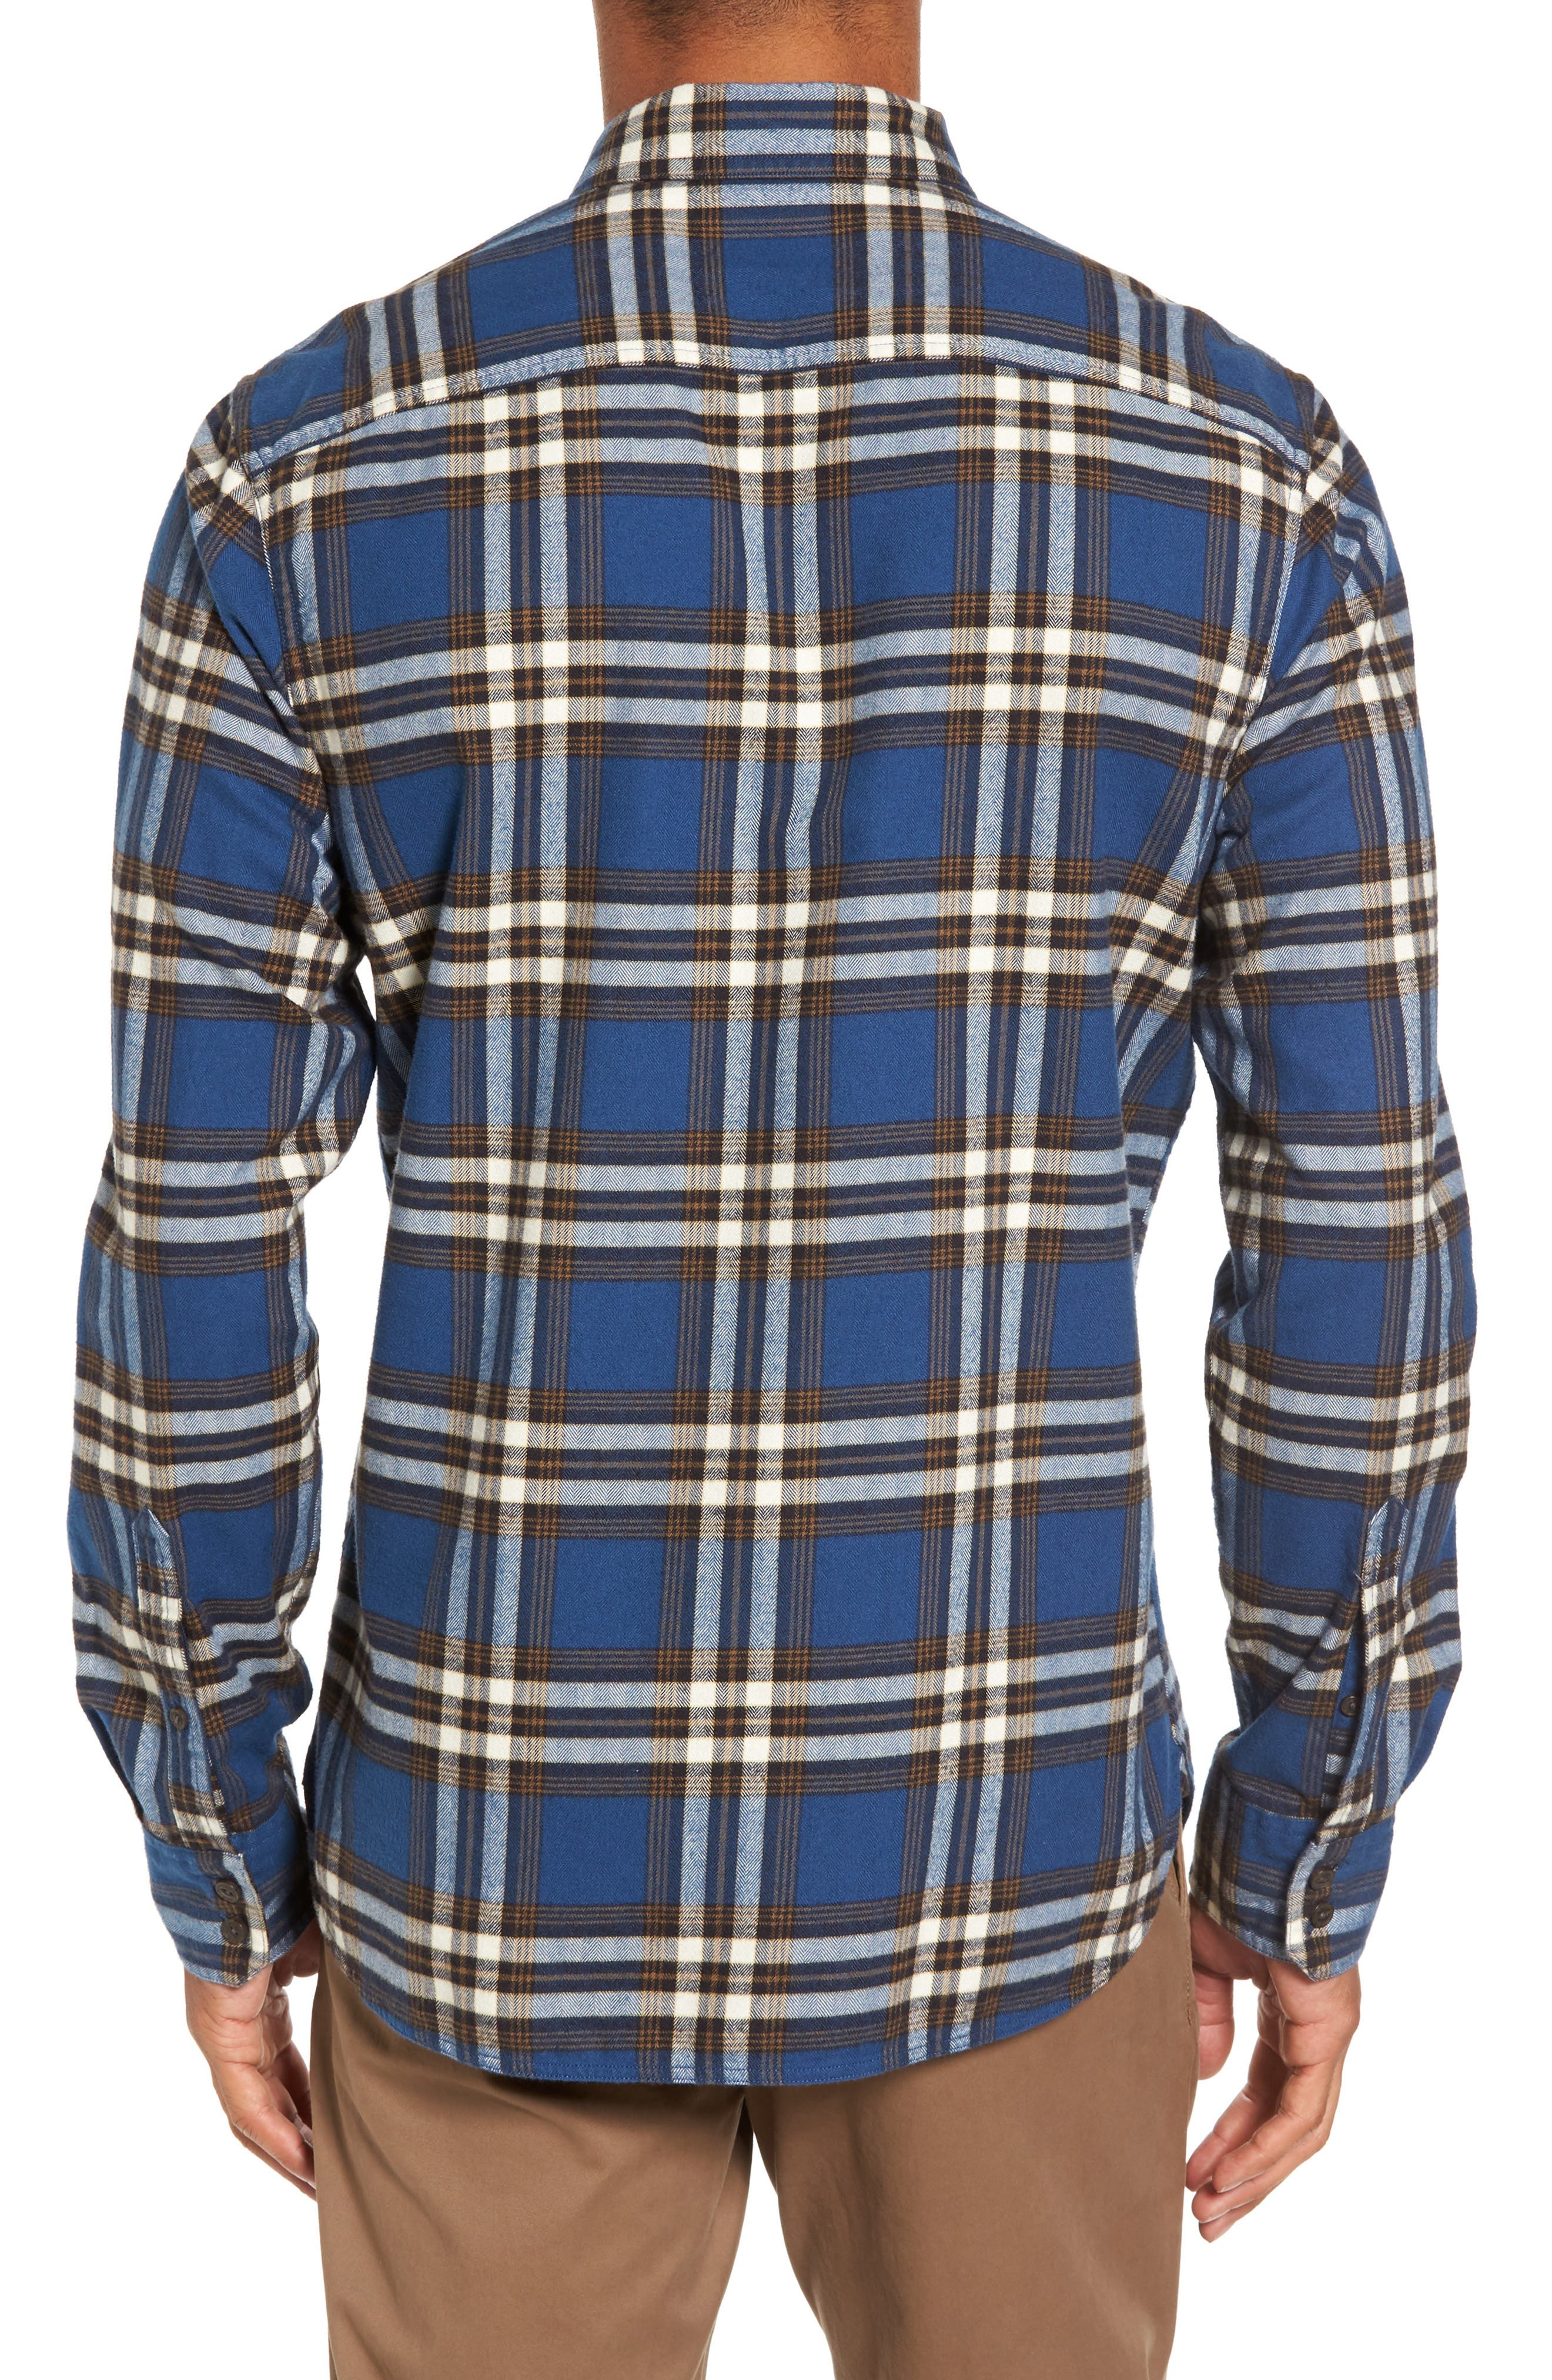 Trim Fit Workwear Check Flannel Shirt,                             Alternate thumbnail 2, color,                             Blue Vintage Brown Plaid